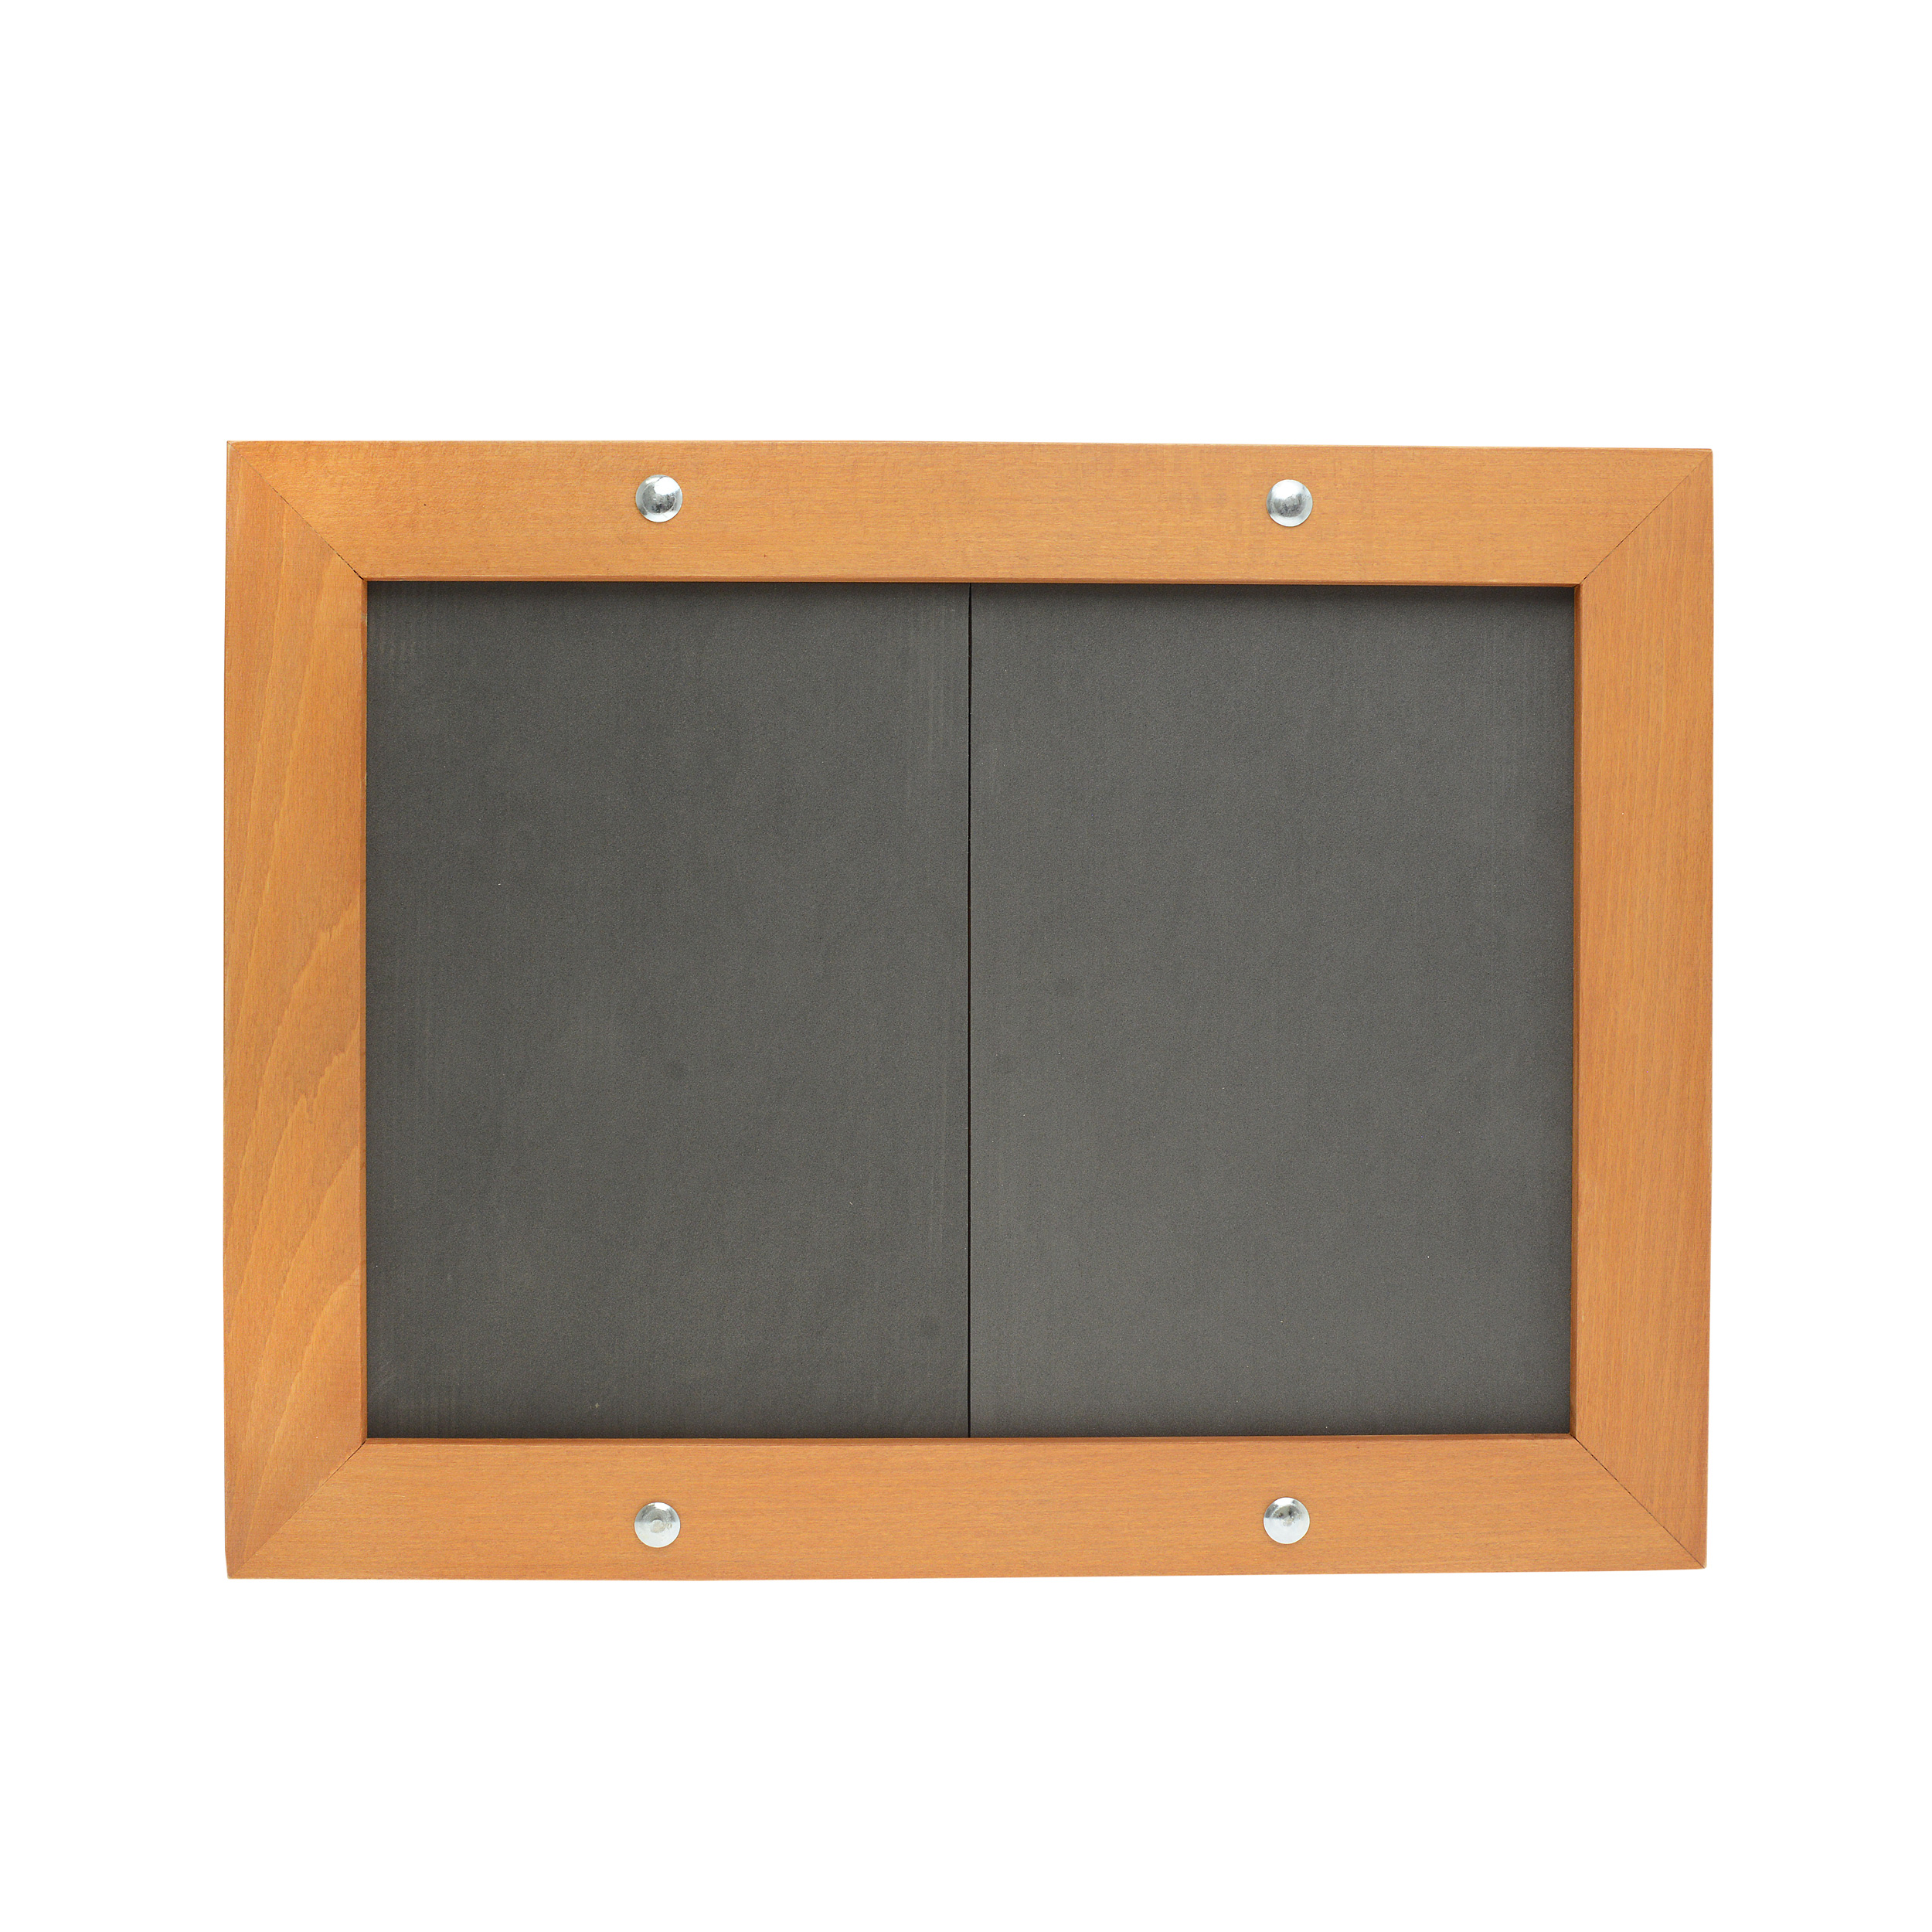 fotoimpex kontaktprint rahmen aus holz 30x40cm fotochemie analoge fotografie. Black Bedroom Furniture Sets. Home Design Ideas